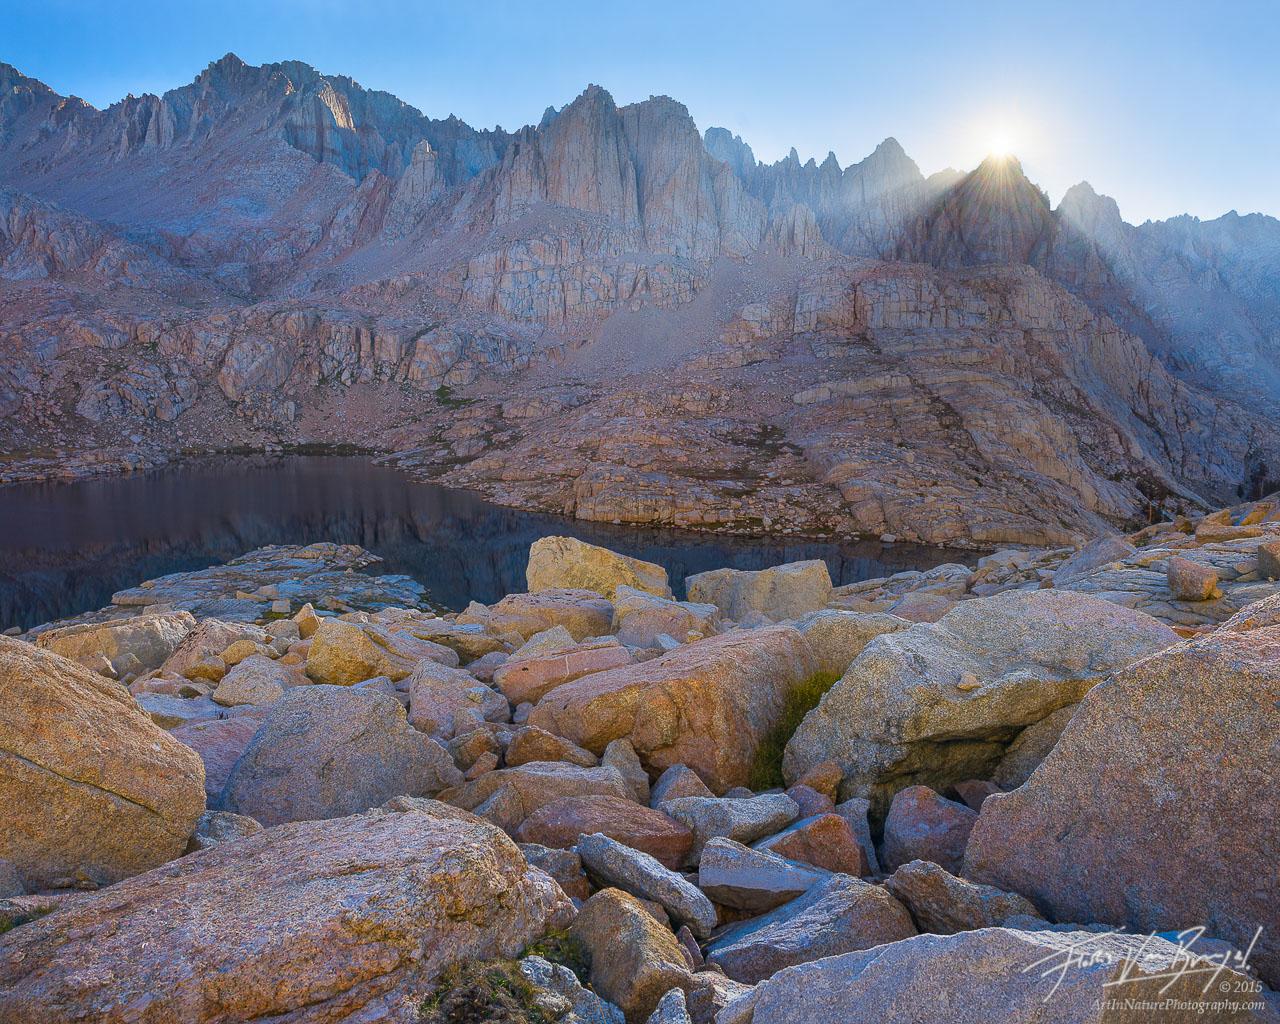 Sierra Crest, Sunshine, Granite, photo